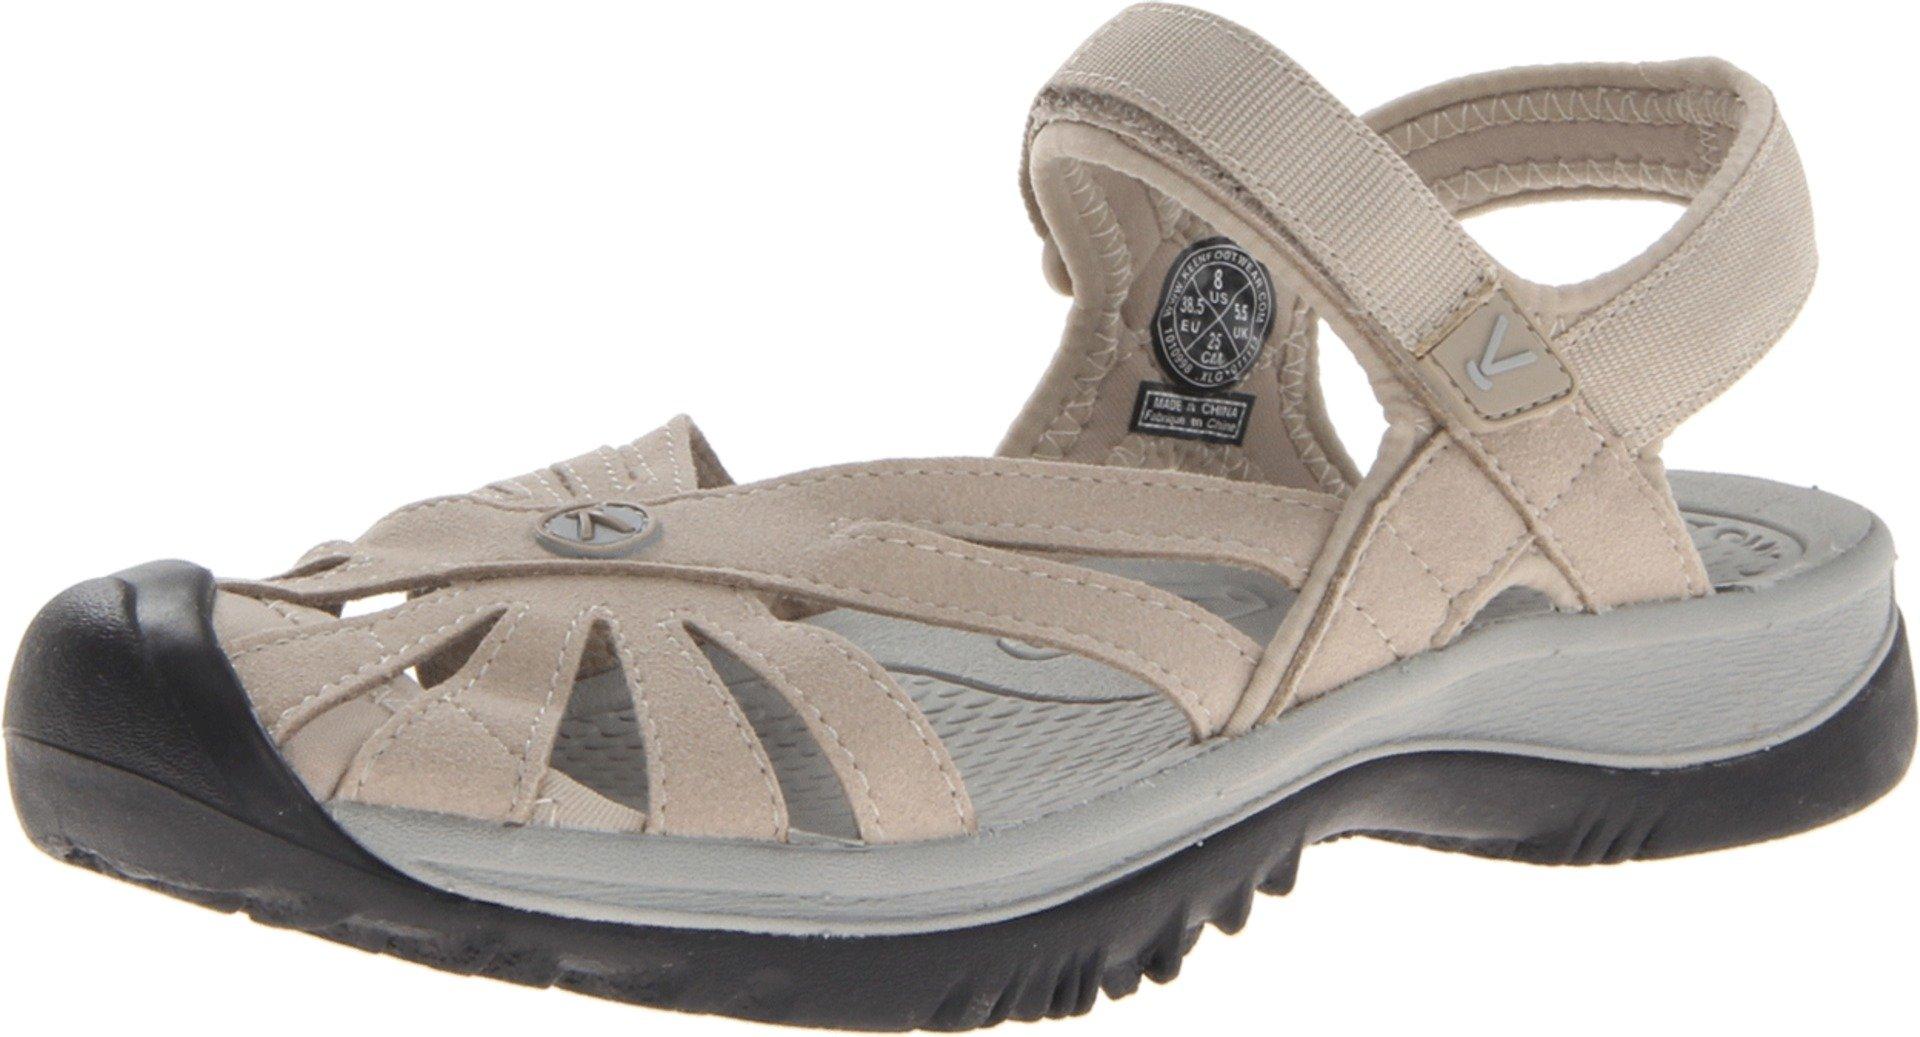 KEEN Women's Rose Sandal,Aluminium/Neutral Gray,8 M US